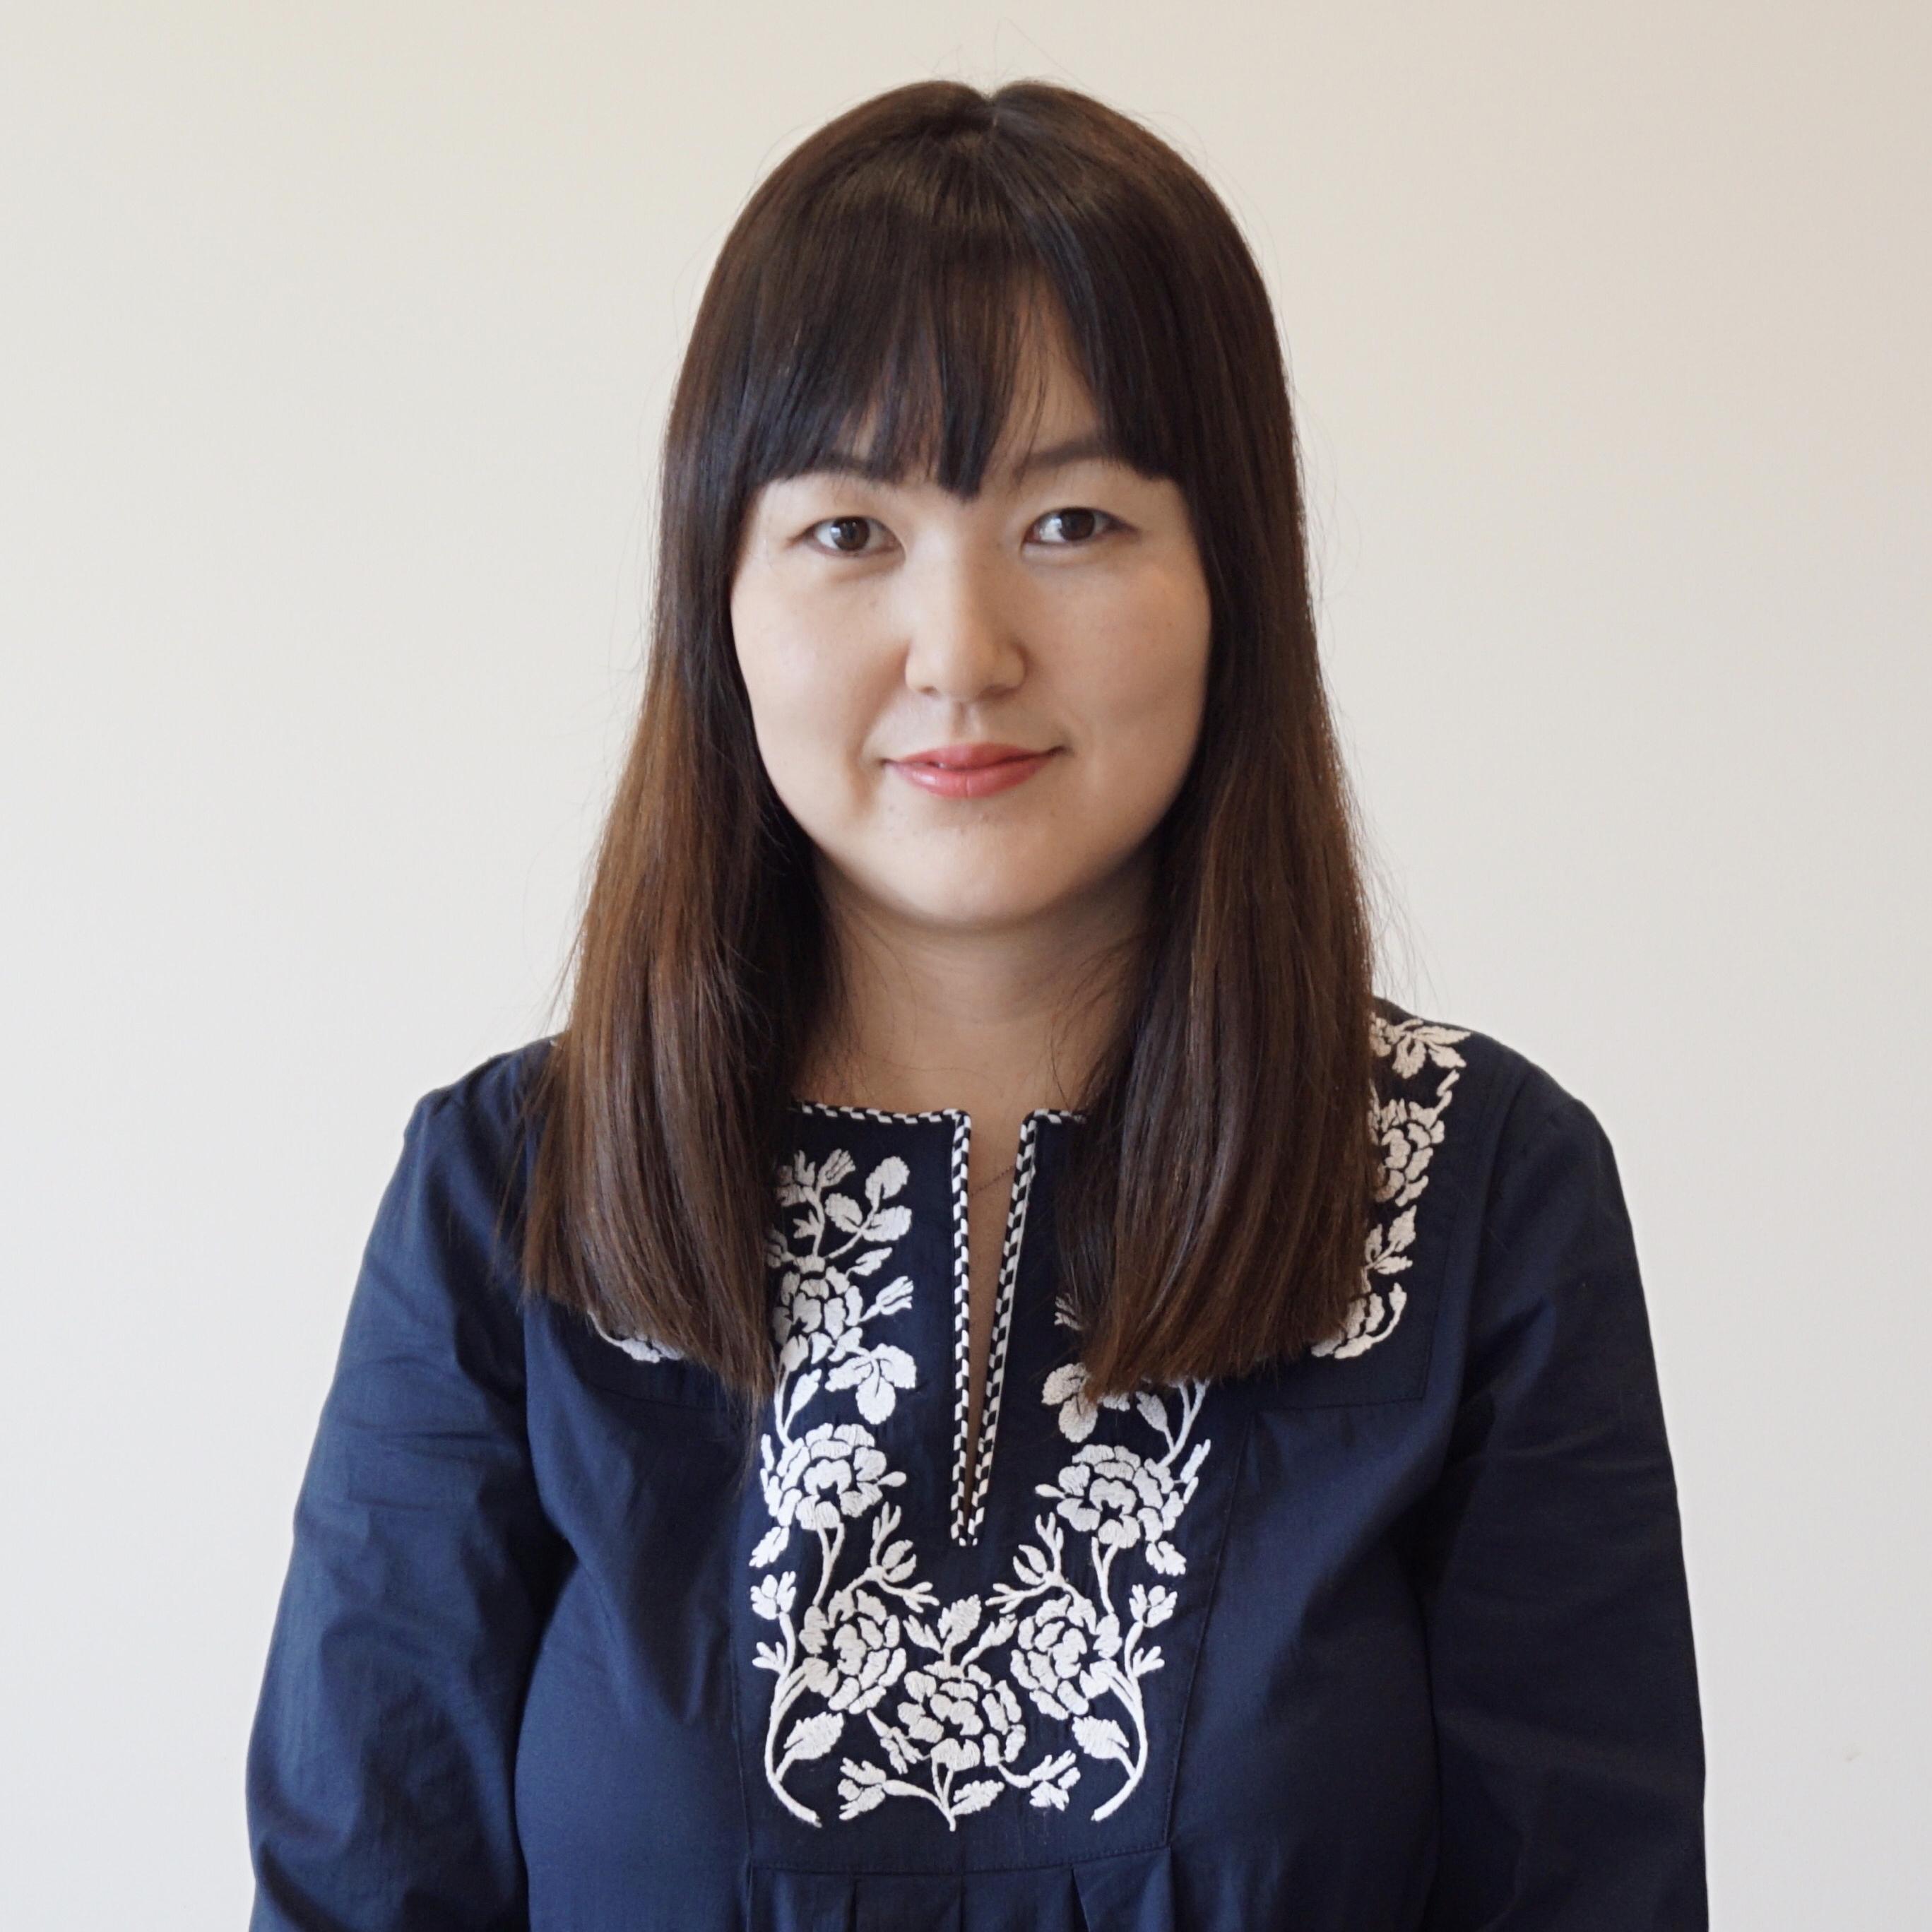 Jinsook Kim